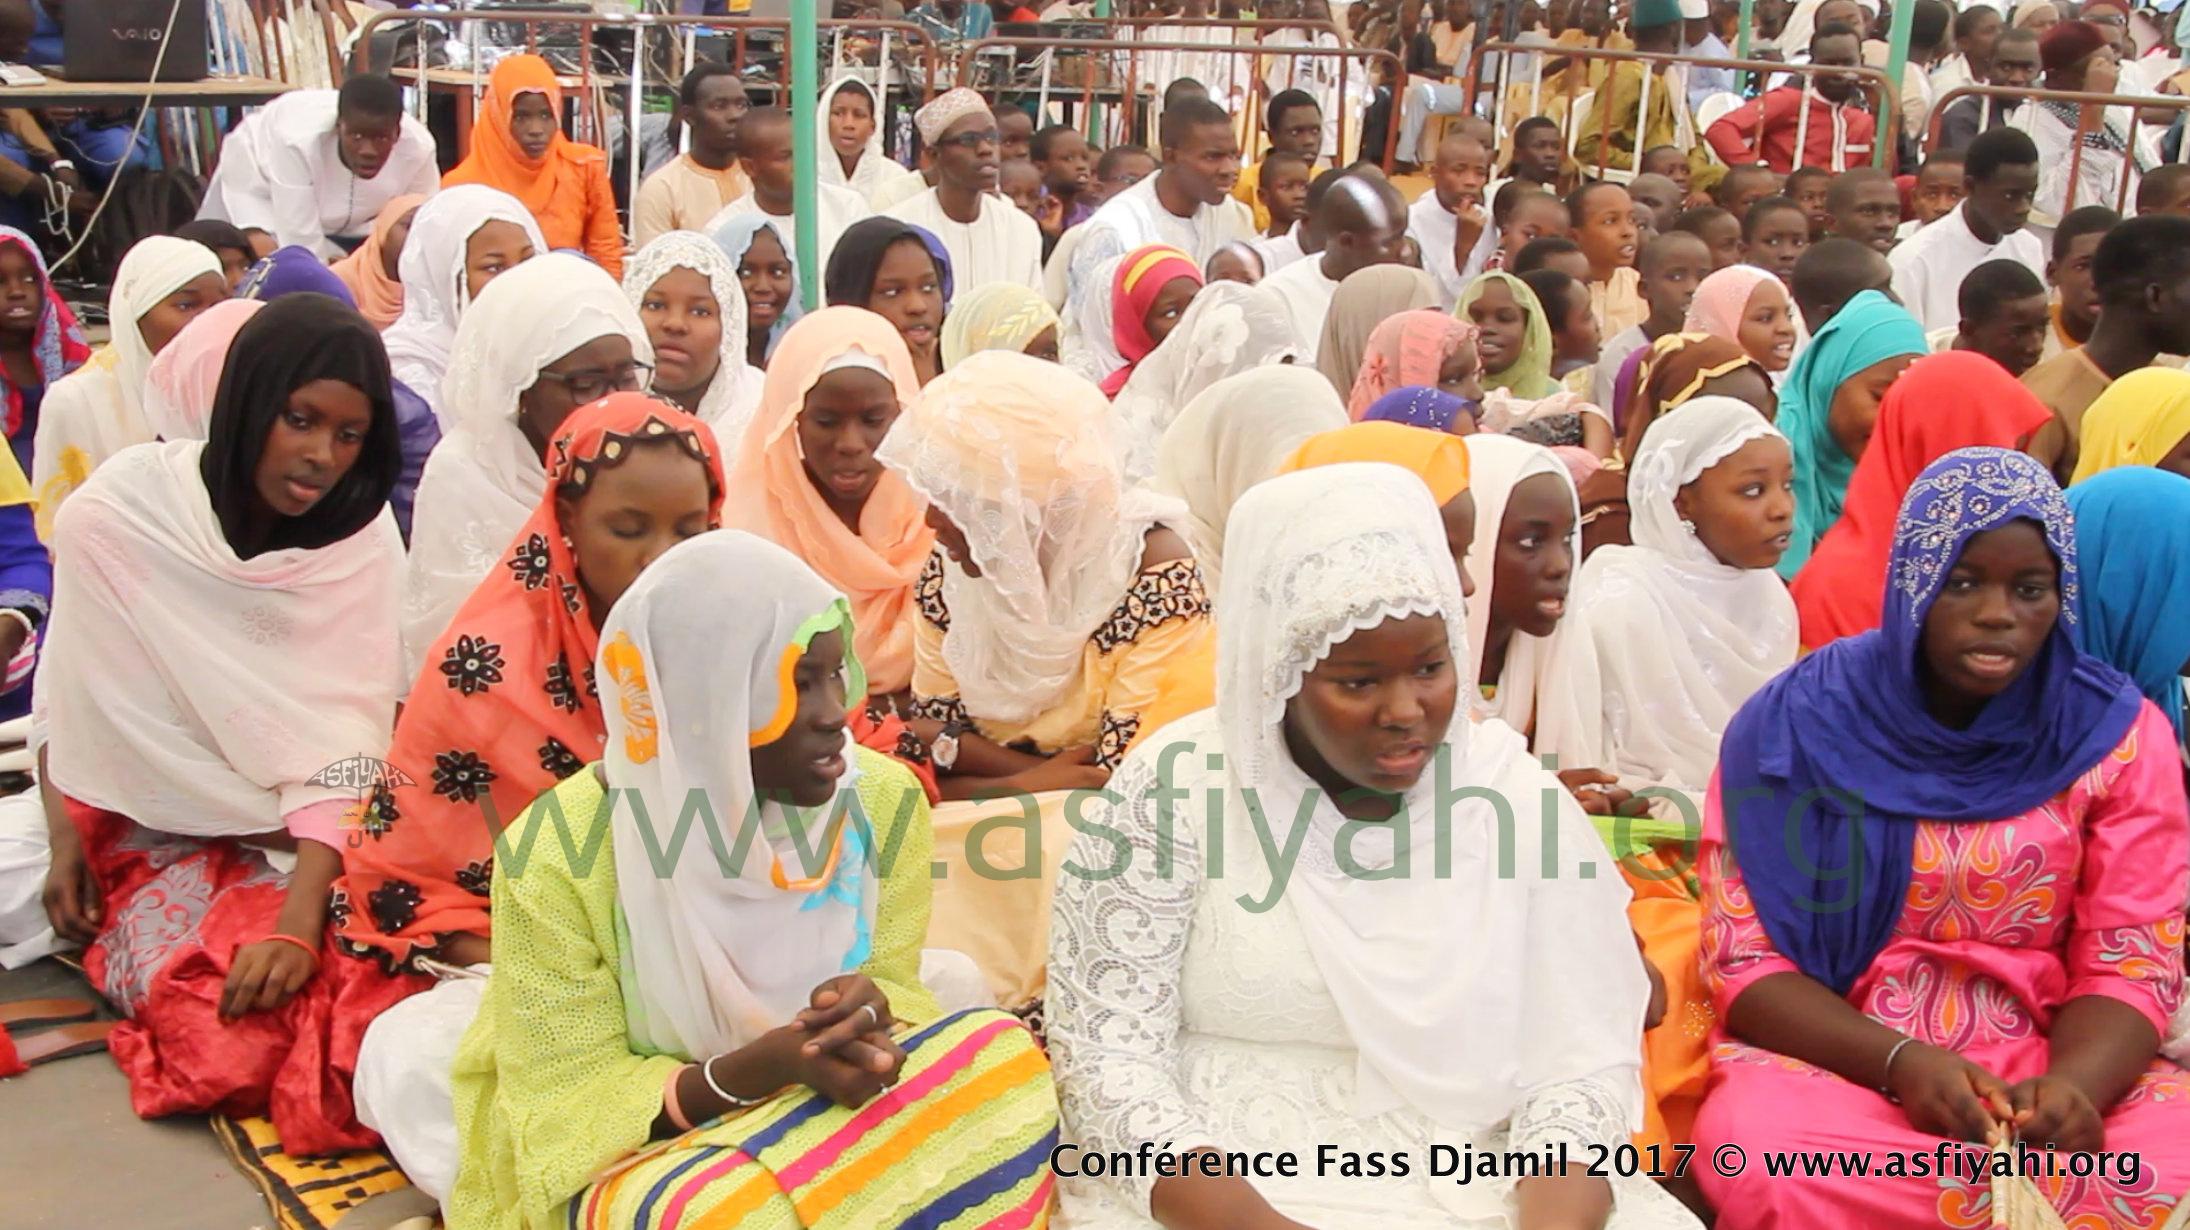 PHOTOS - Les Images de la Conférence Ramadan 2017 de la Hadara Seydi Djamil, presidée par Serigne Pape Malick Sy et Serigne Mansour Sy Djamil